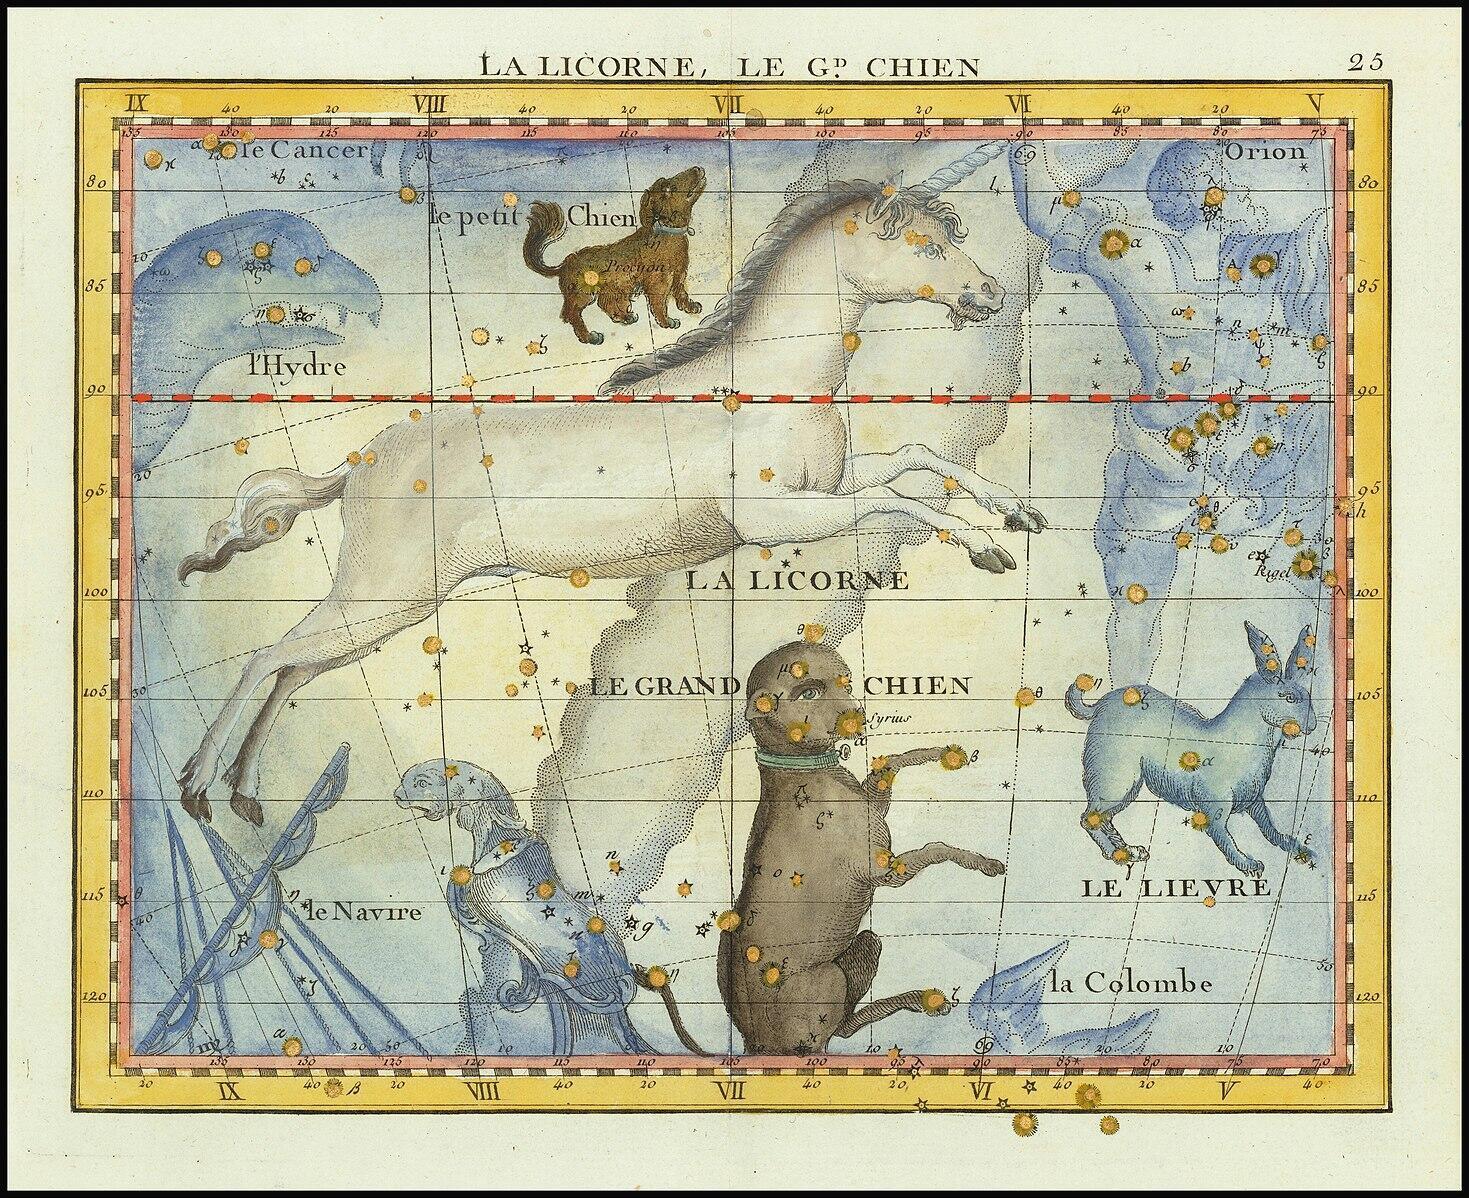 RFI Le_Grand_Chien_(Monoceros_&_Canis_Major)